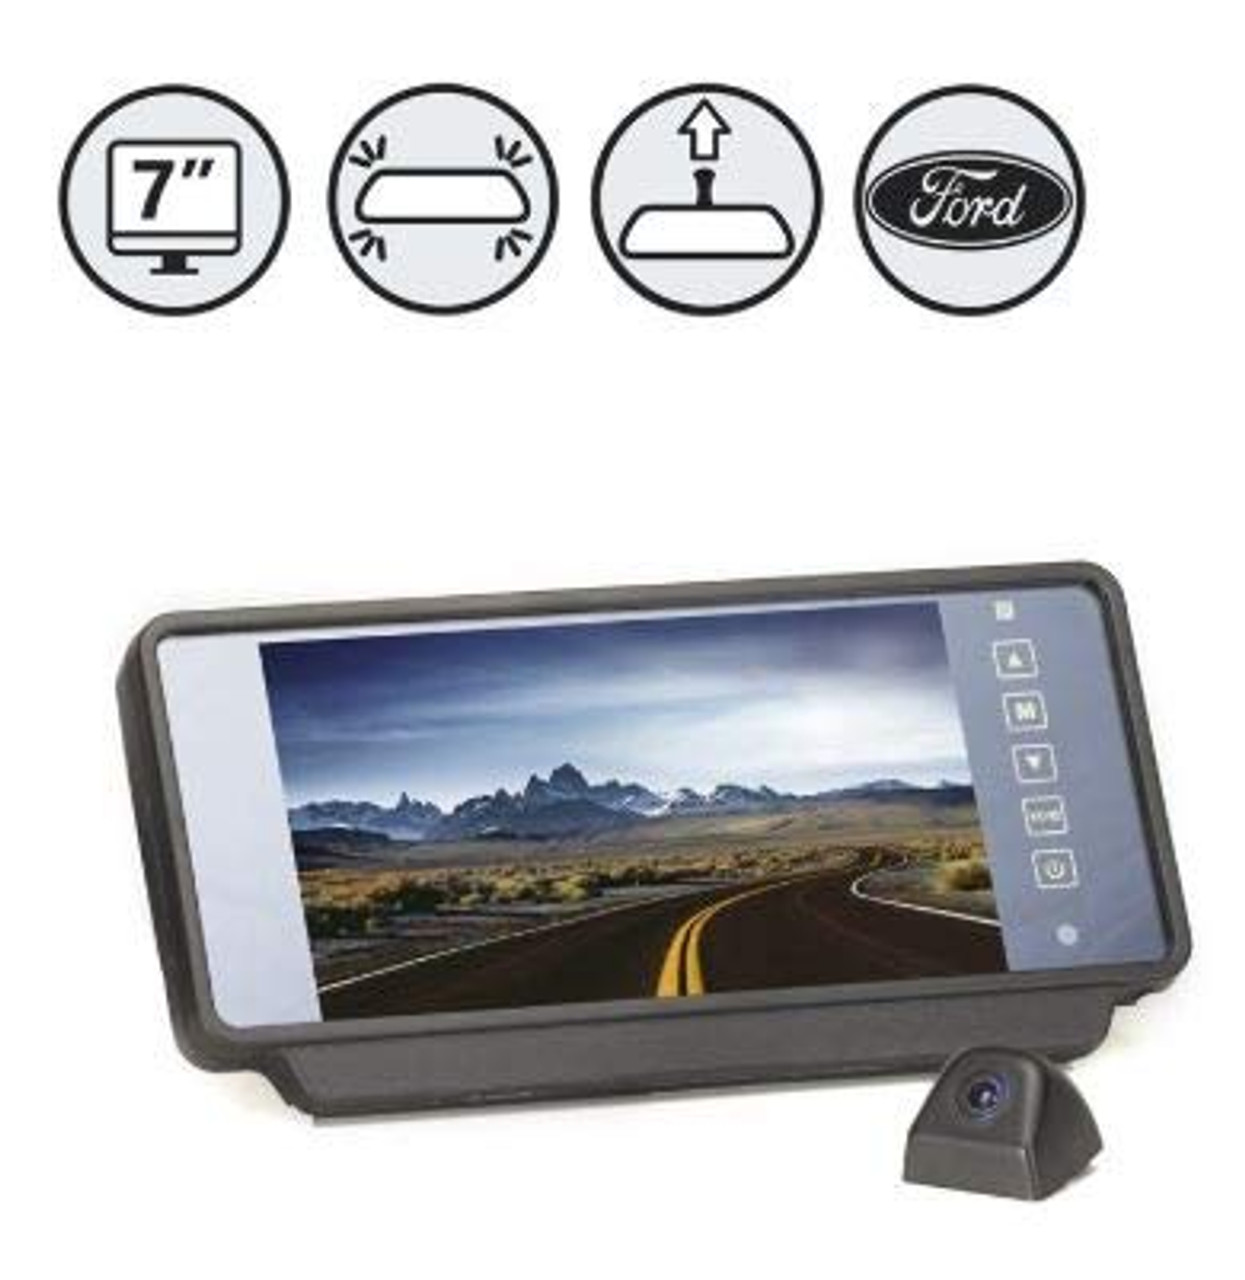 Backup Camera System with MV1 Camera (RVS-MV1619-NM)